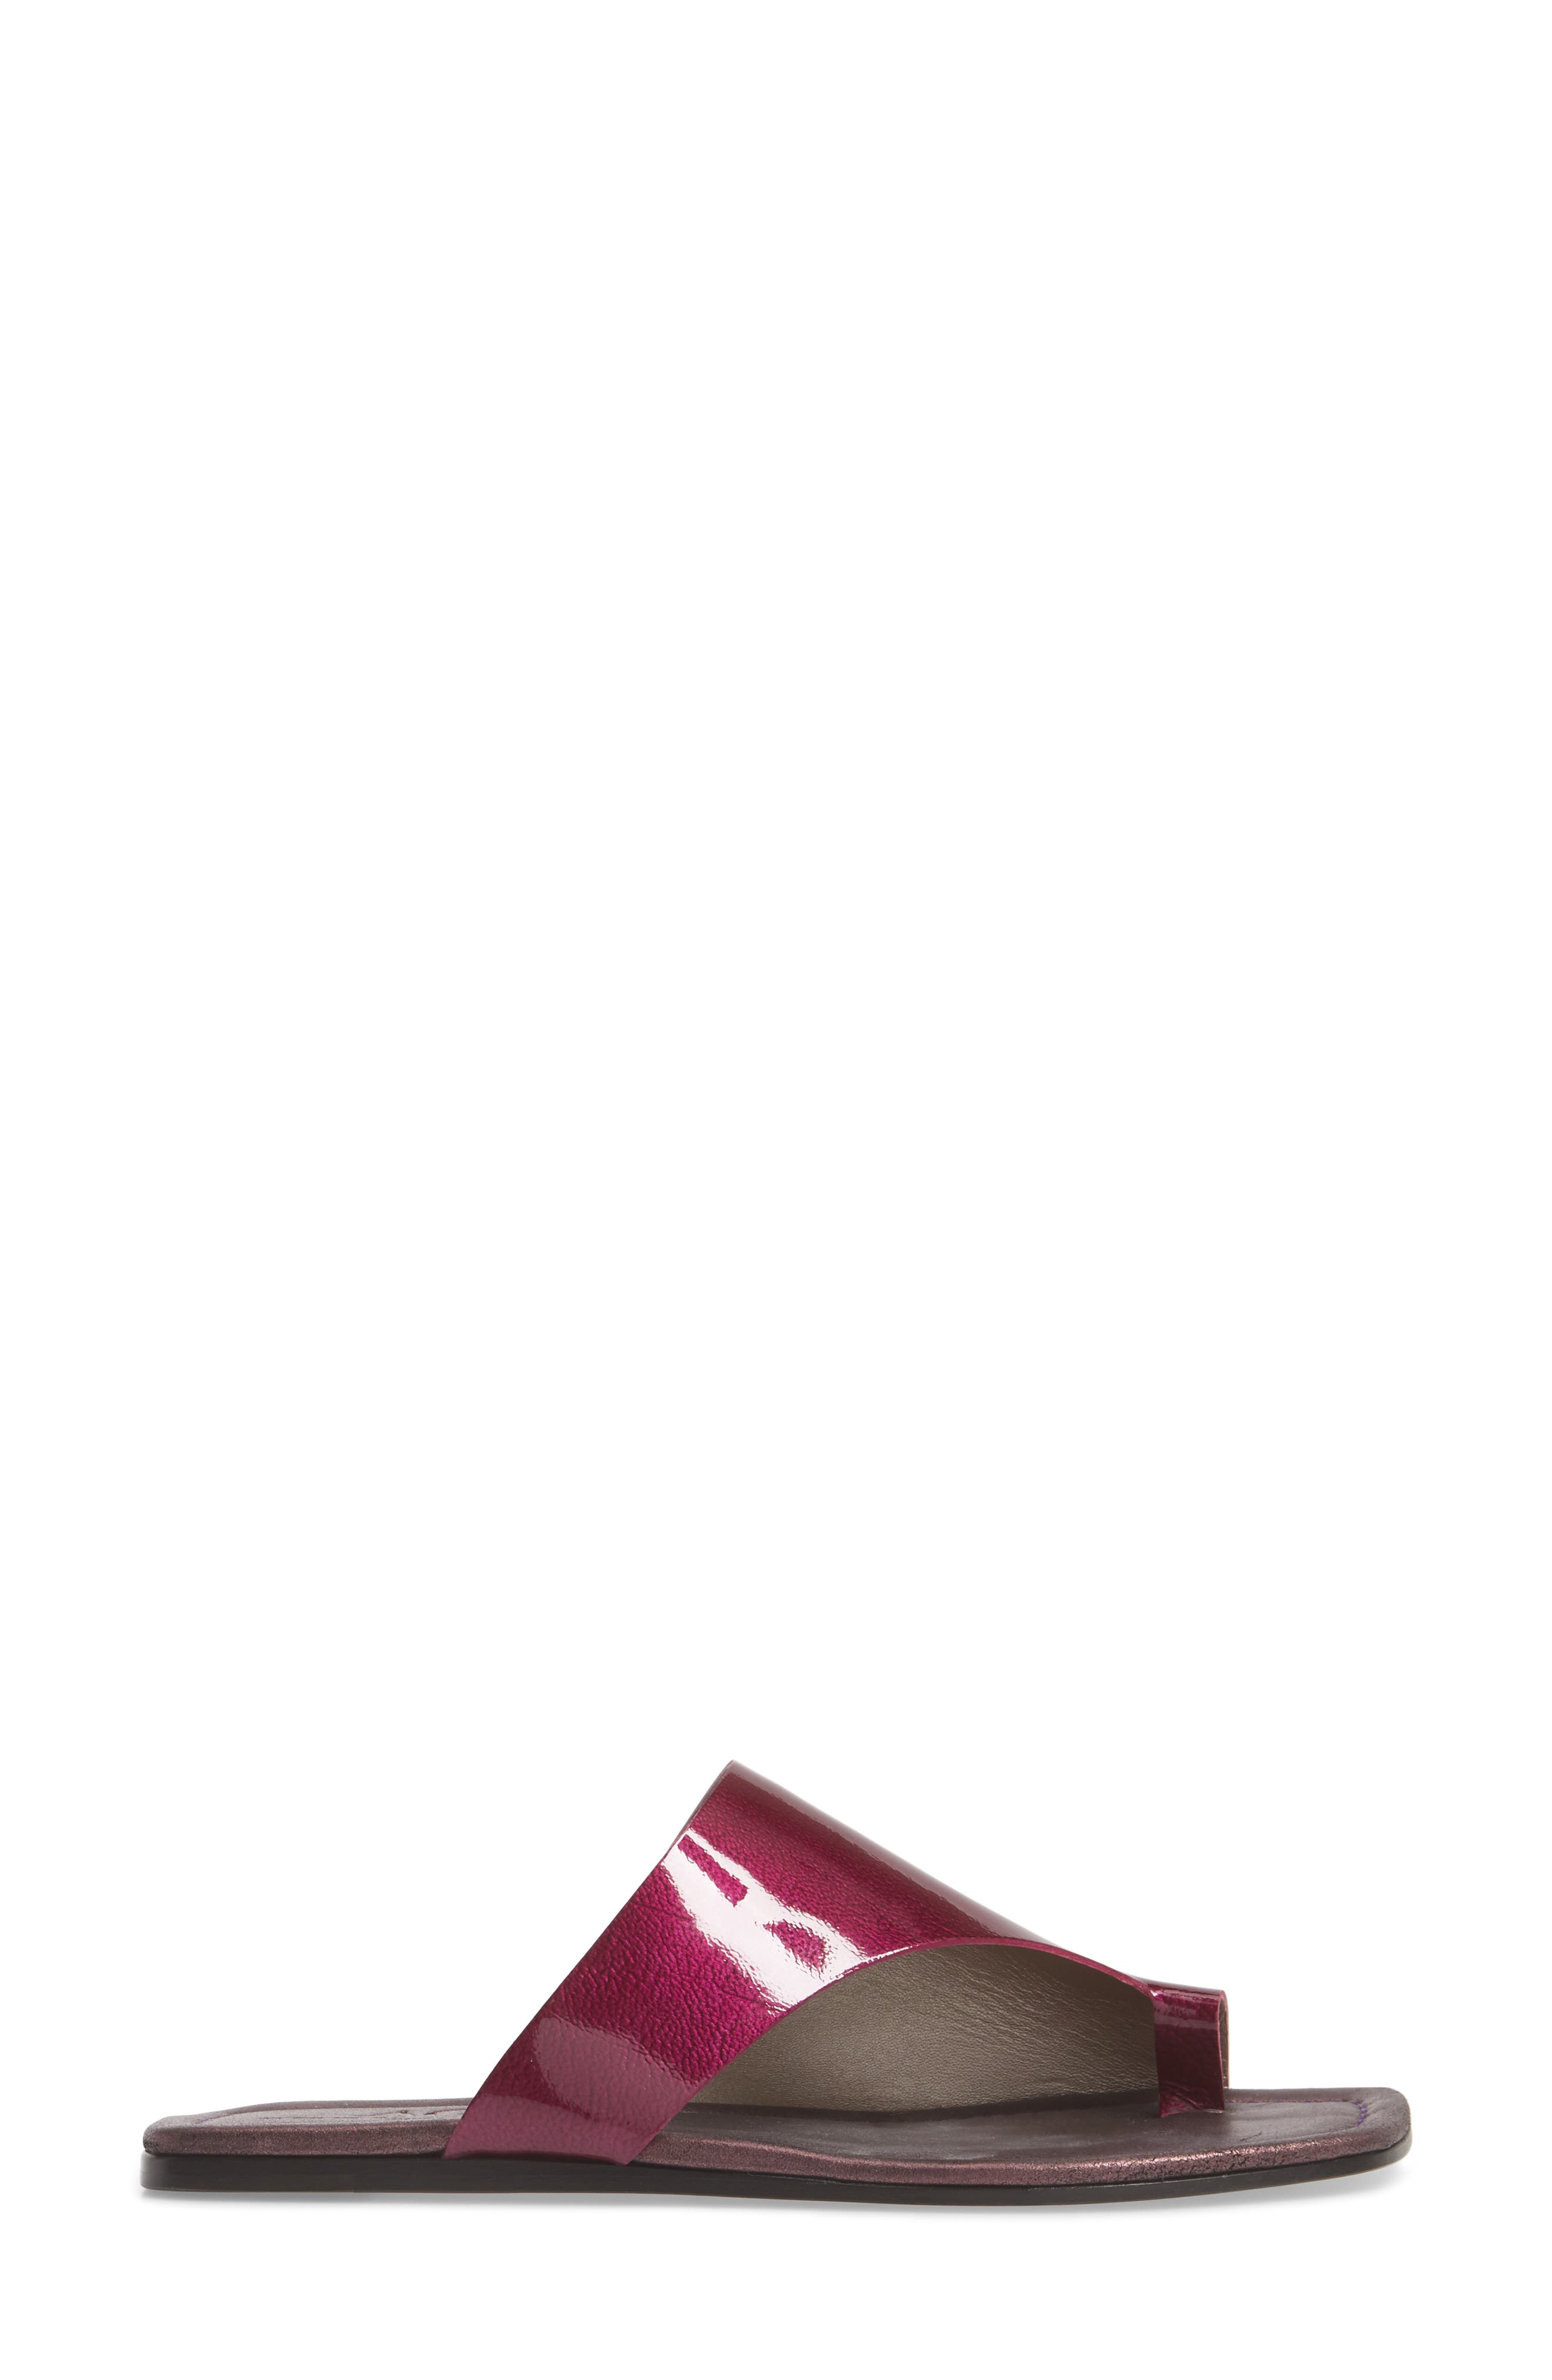 Asymmetrical Toe Thong Sandal,                             Alternate thumbnail 3, color,                             Fuchsia Patent